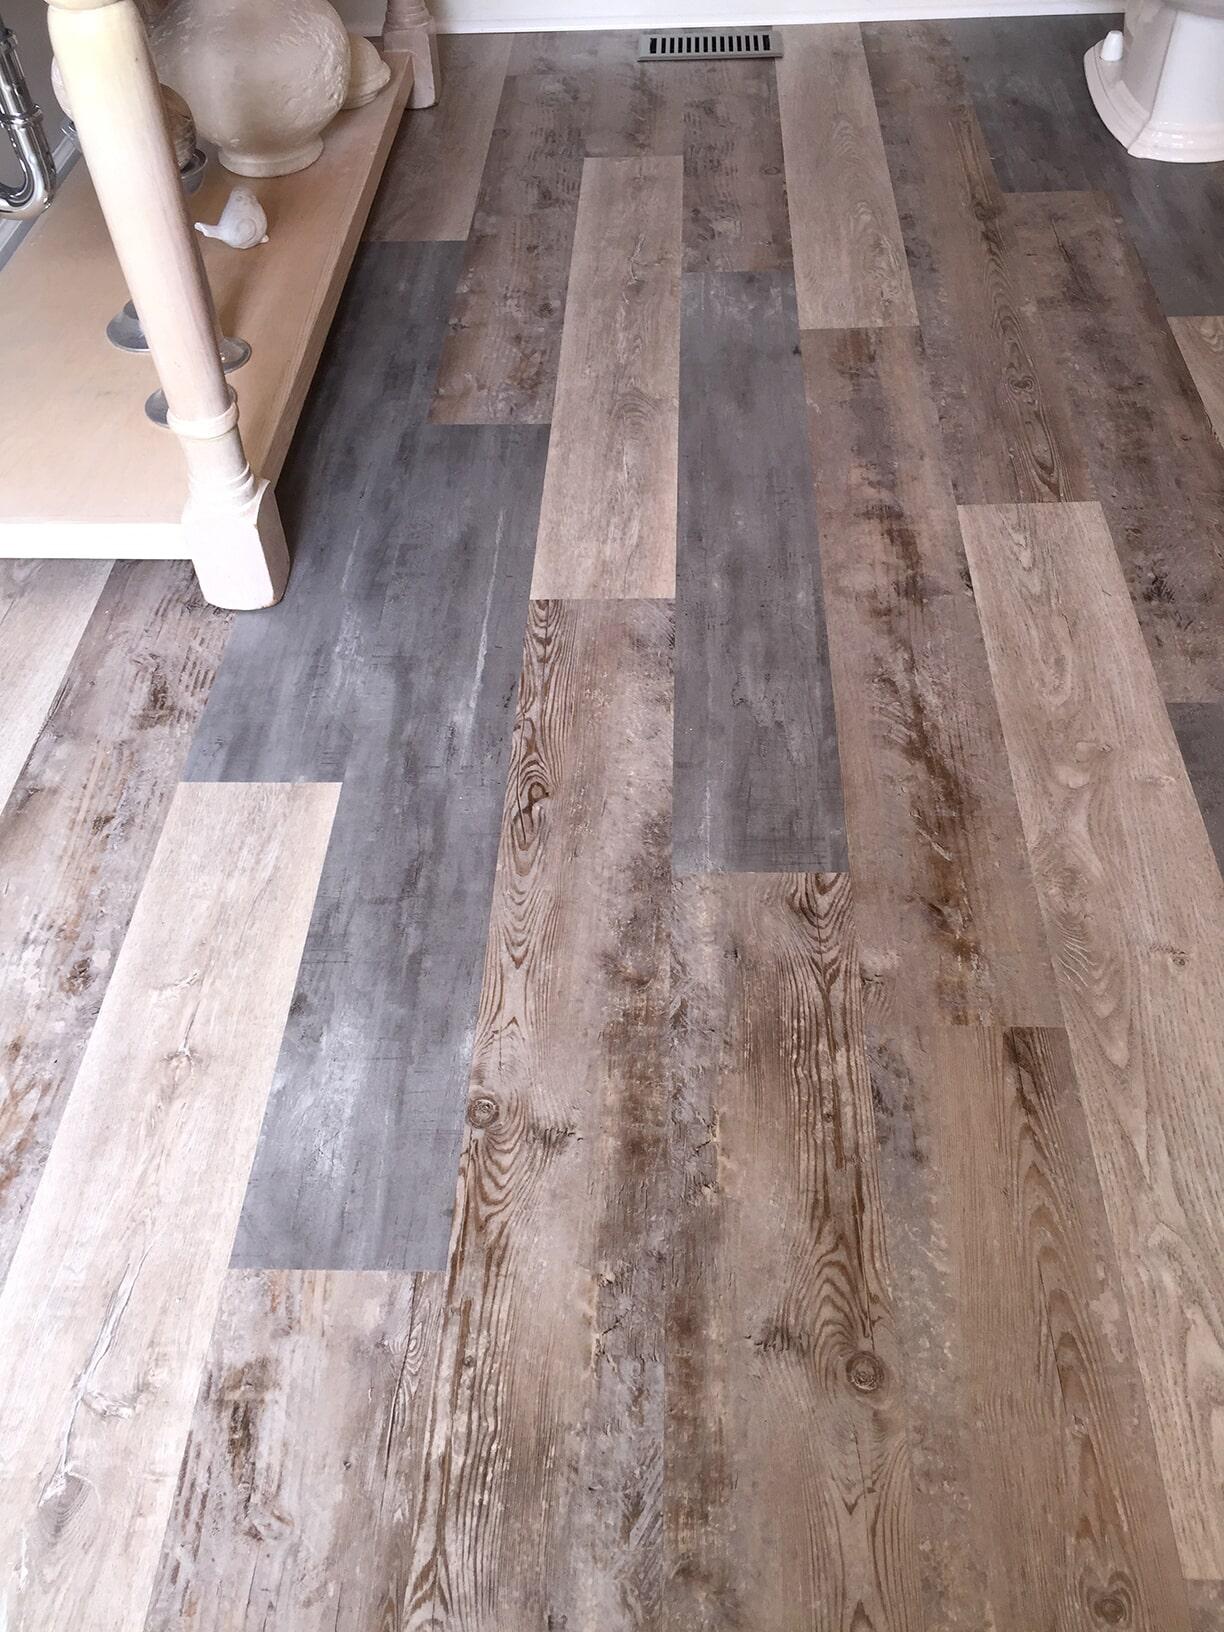 Wood look bathroom floors in Kenley NC from Richie Ballance Flooring